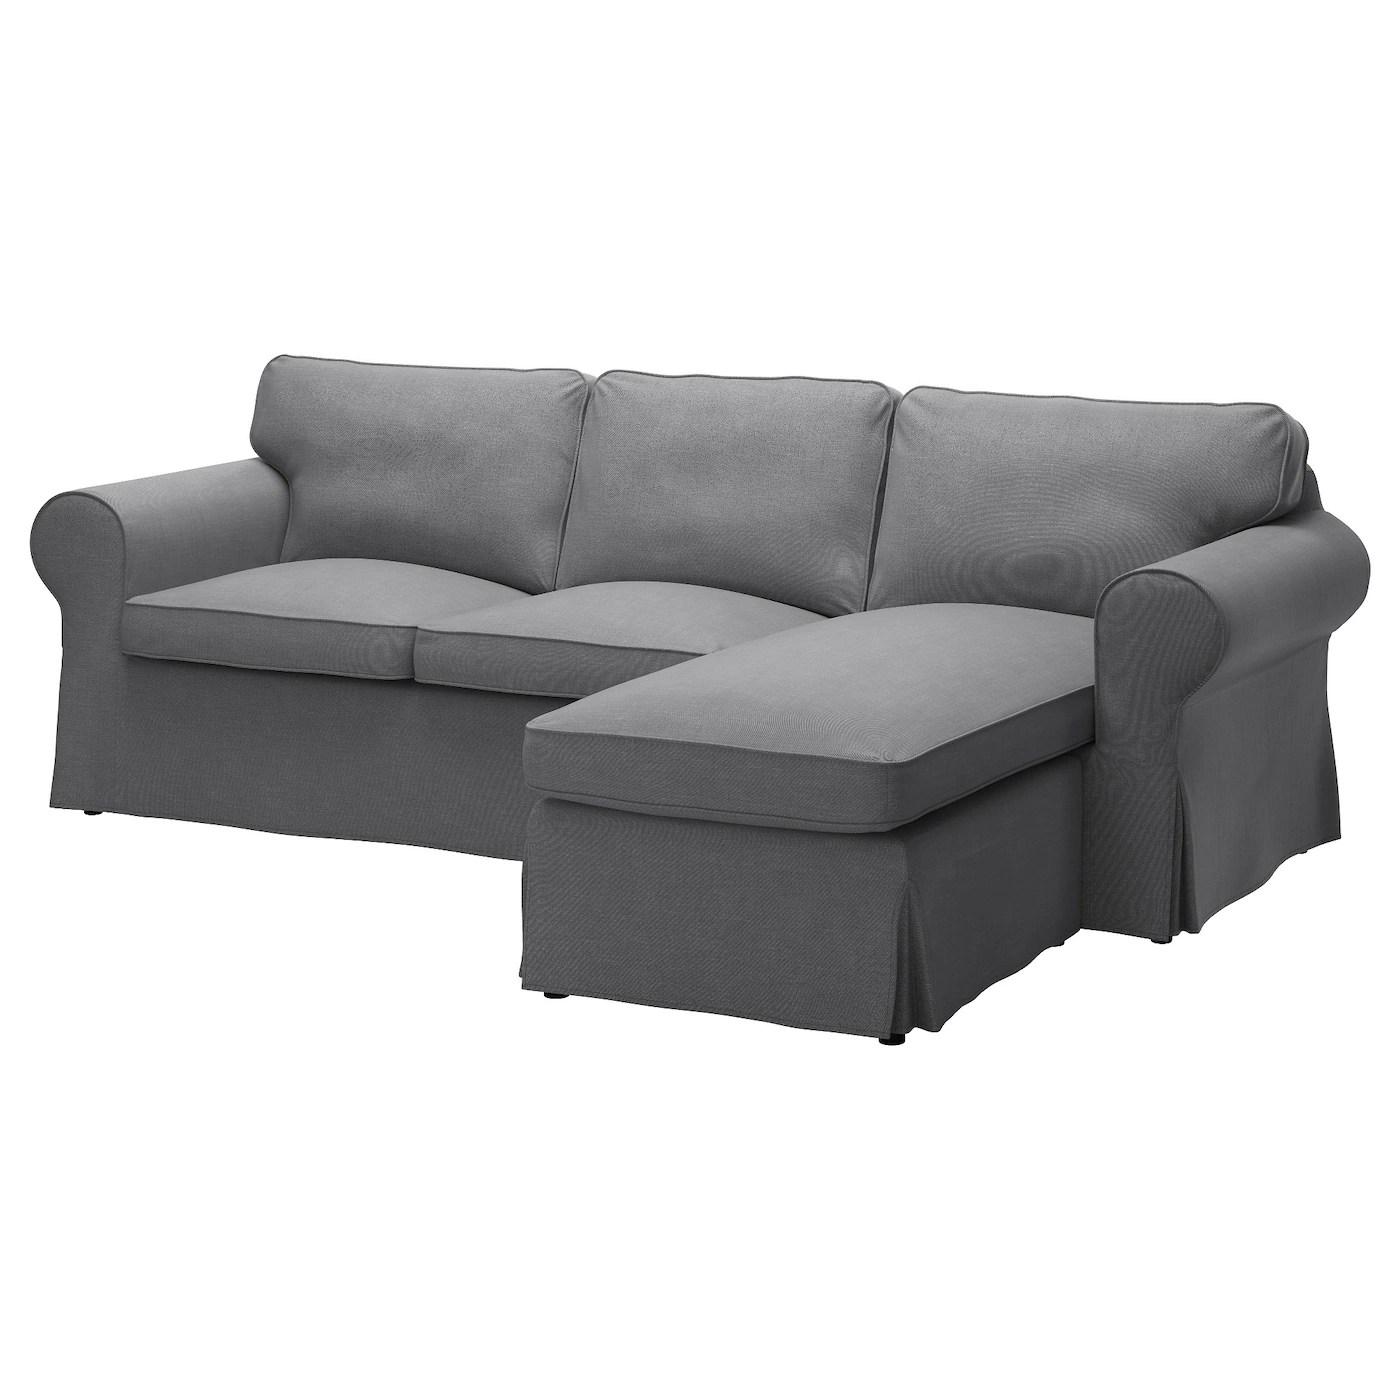 Ektorp Twoseat Sofa And Chaise Longue Nordvalla Dark Grey